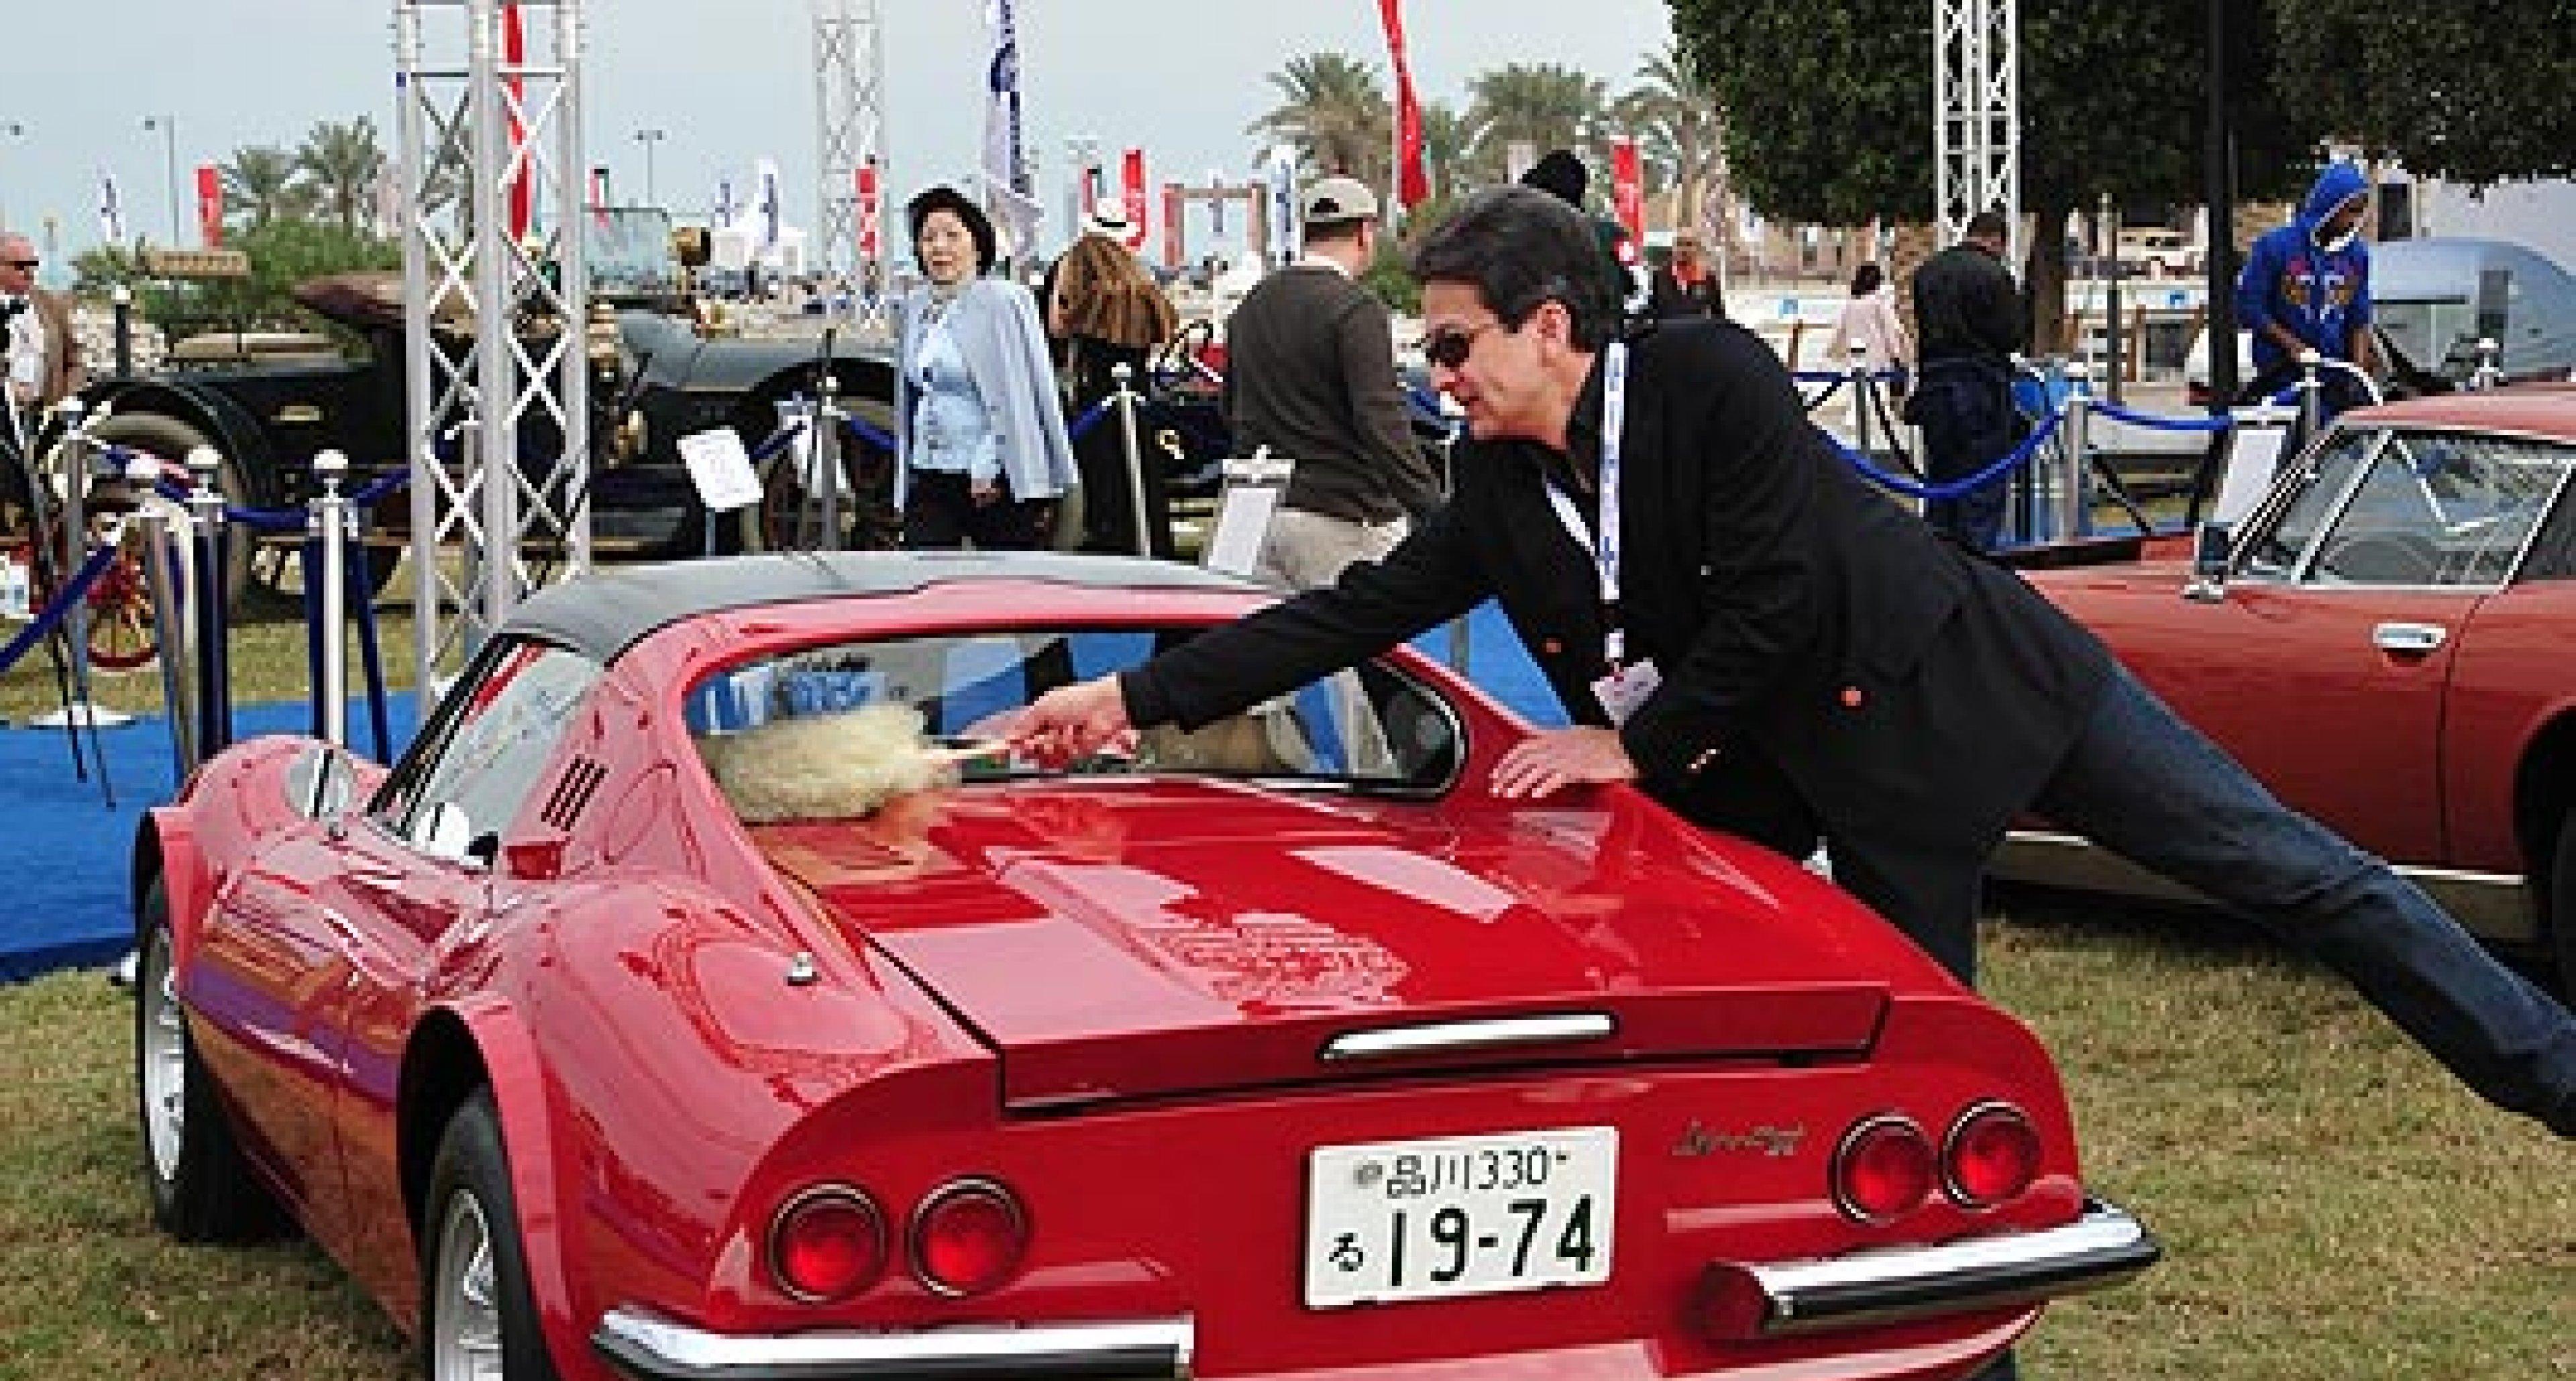 Kuwait Concours d'Elegance, 2-6 February 2011